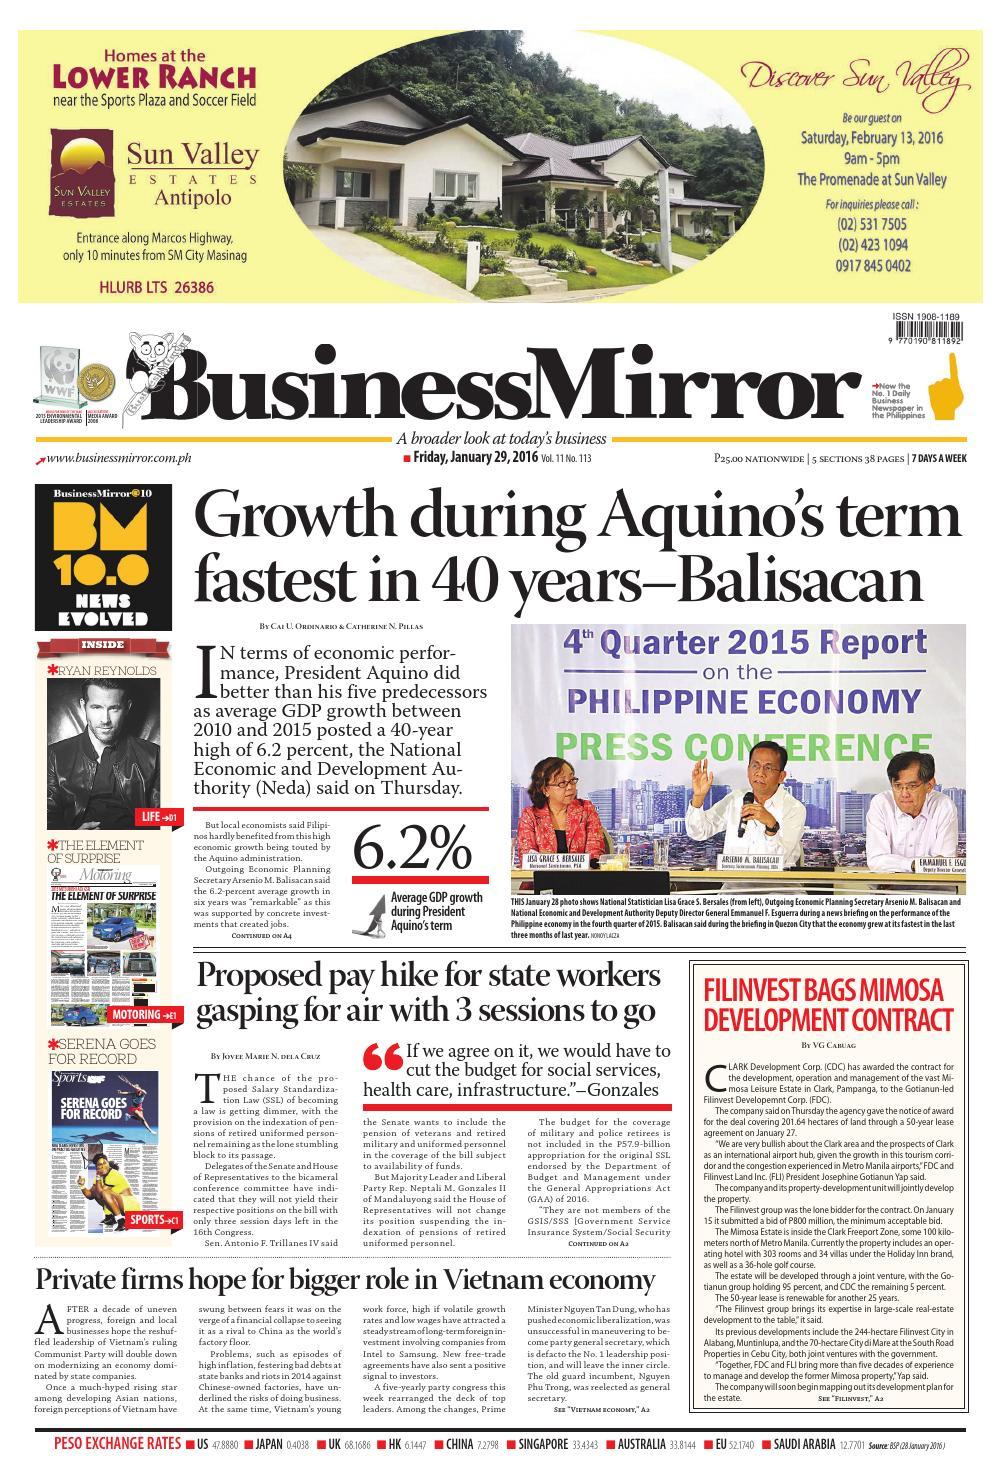 BusinessMirror January 29, 2016 by BusinessMirror - issuu